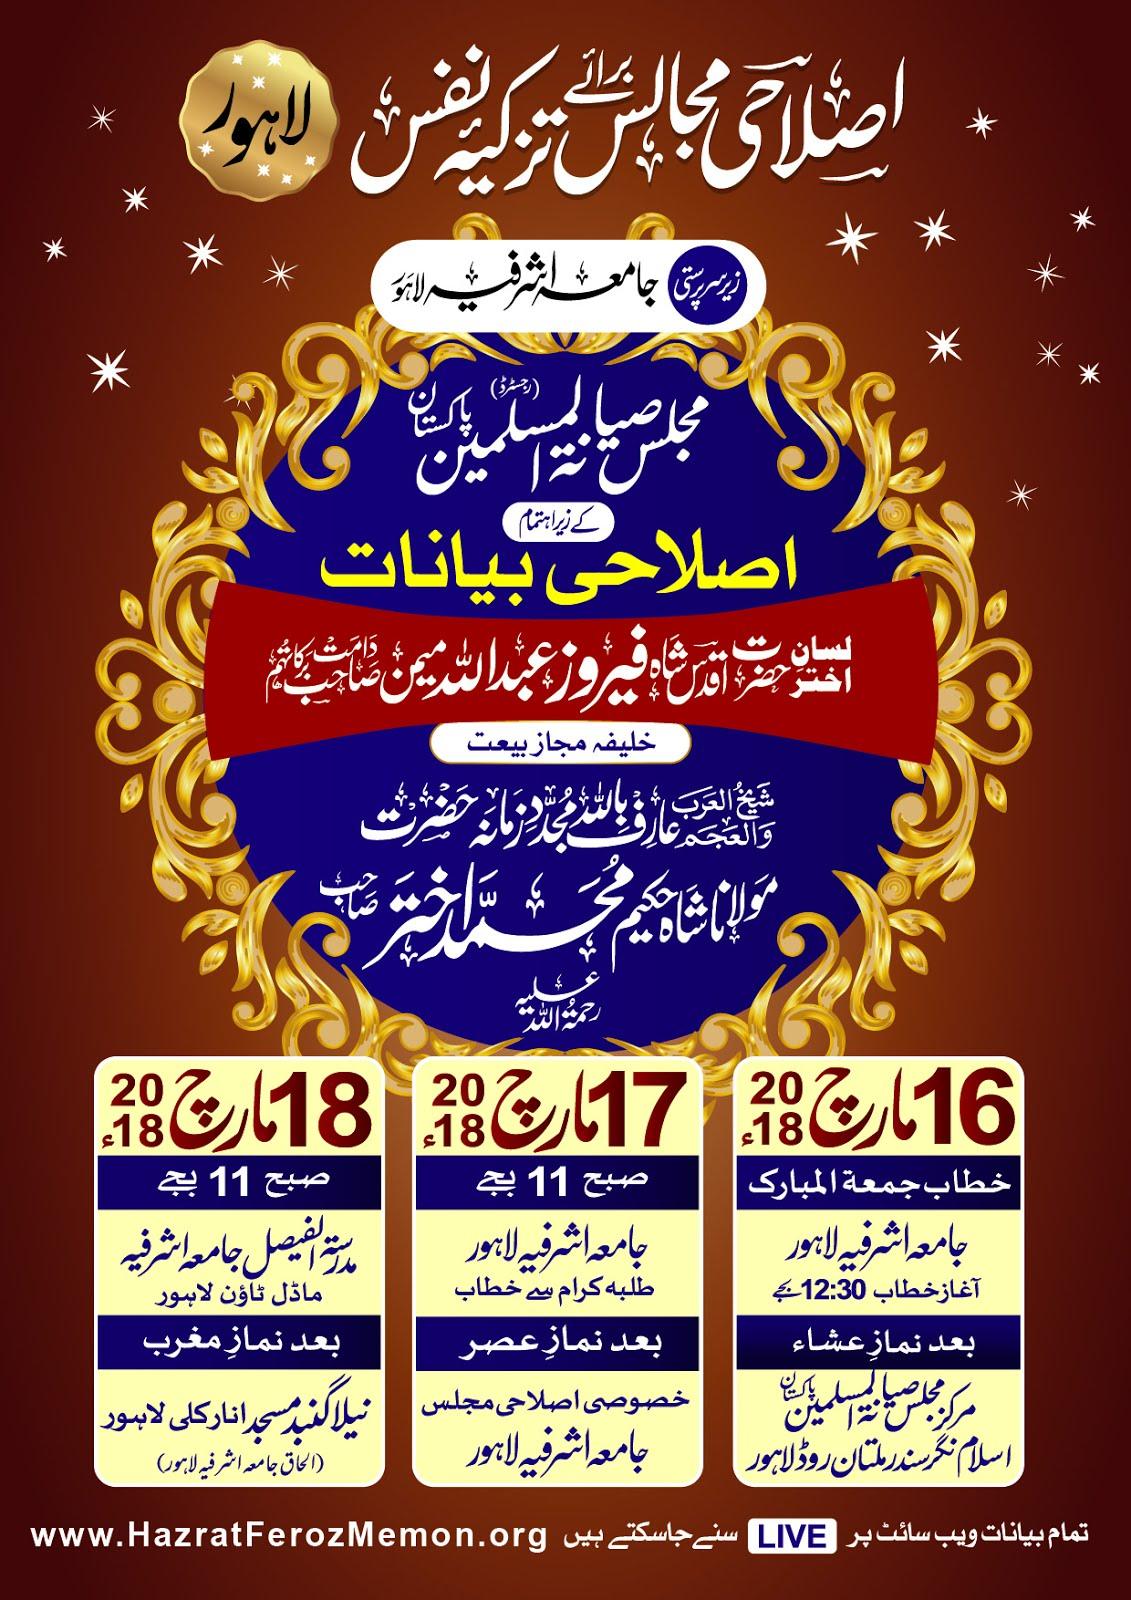 16-18 March 2018 Lahore Safer :Hazrat Aqdas Shah Feroz Memon sb db